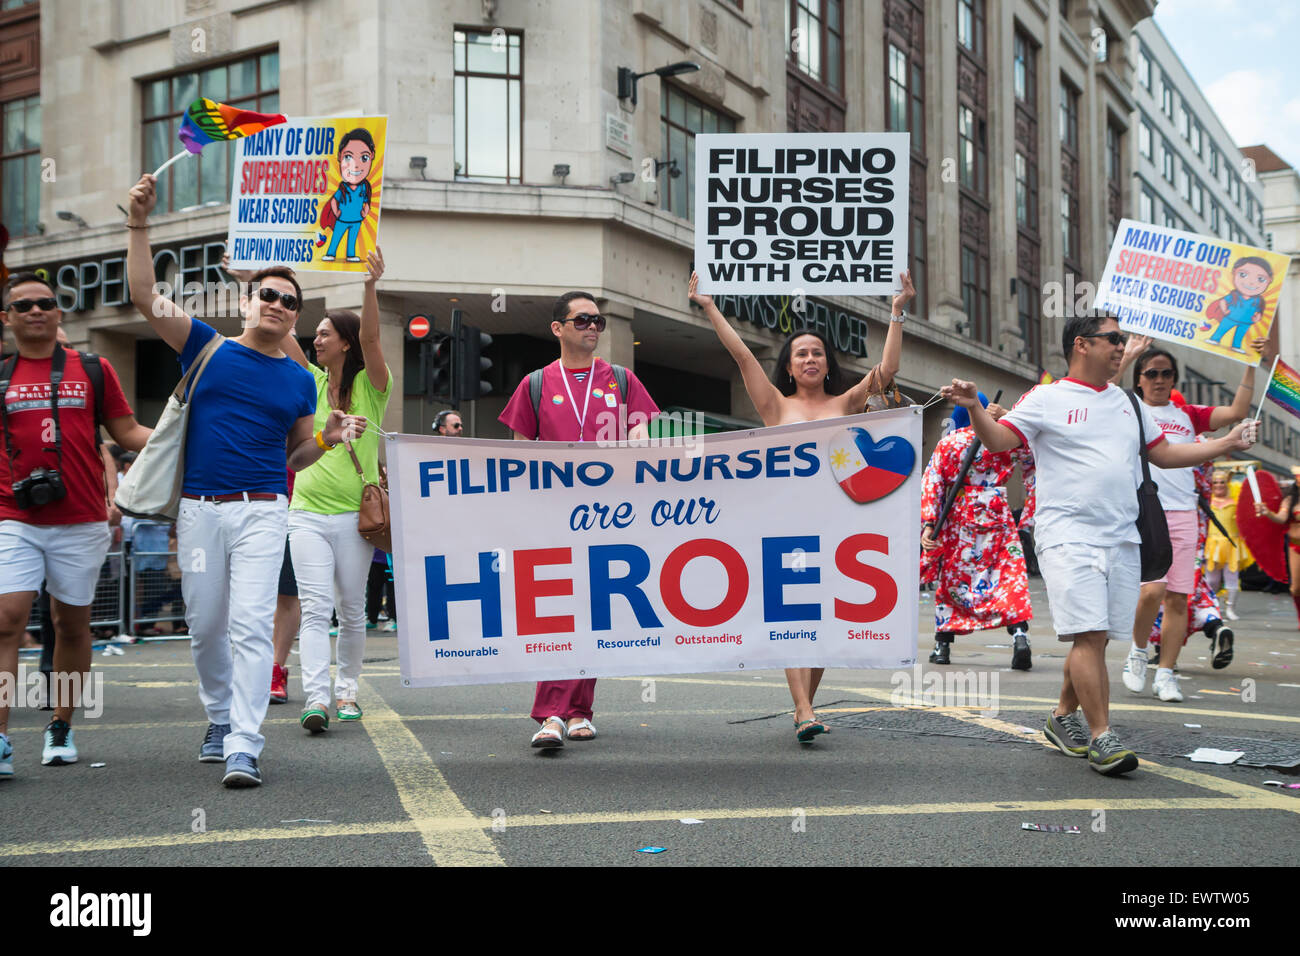 Filipino nurses at Pride in London 2015 - Stock Image